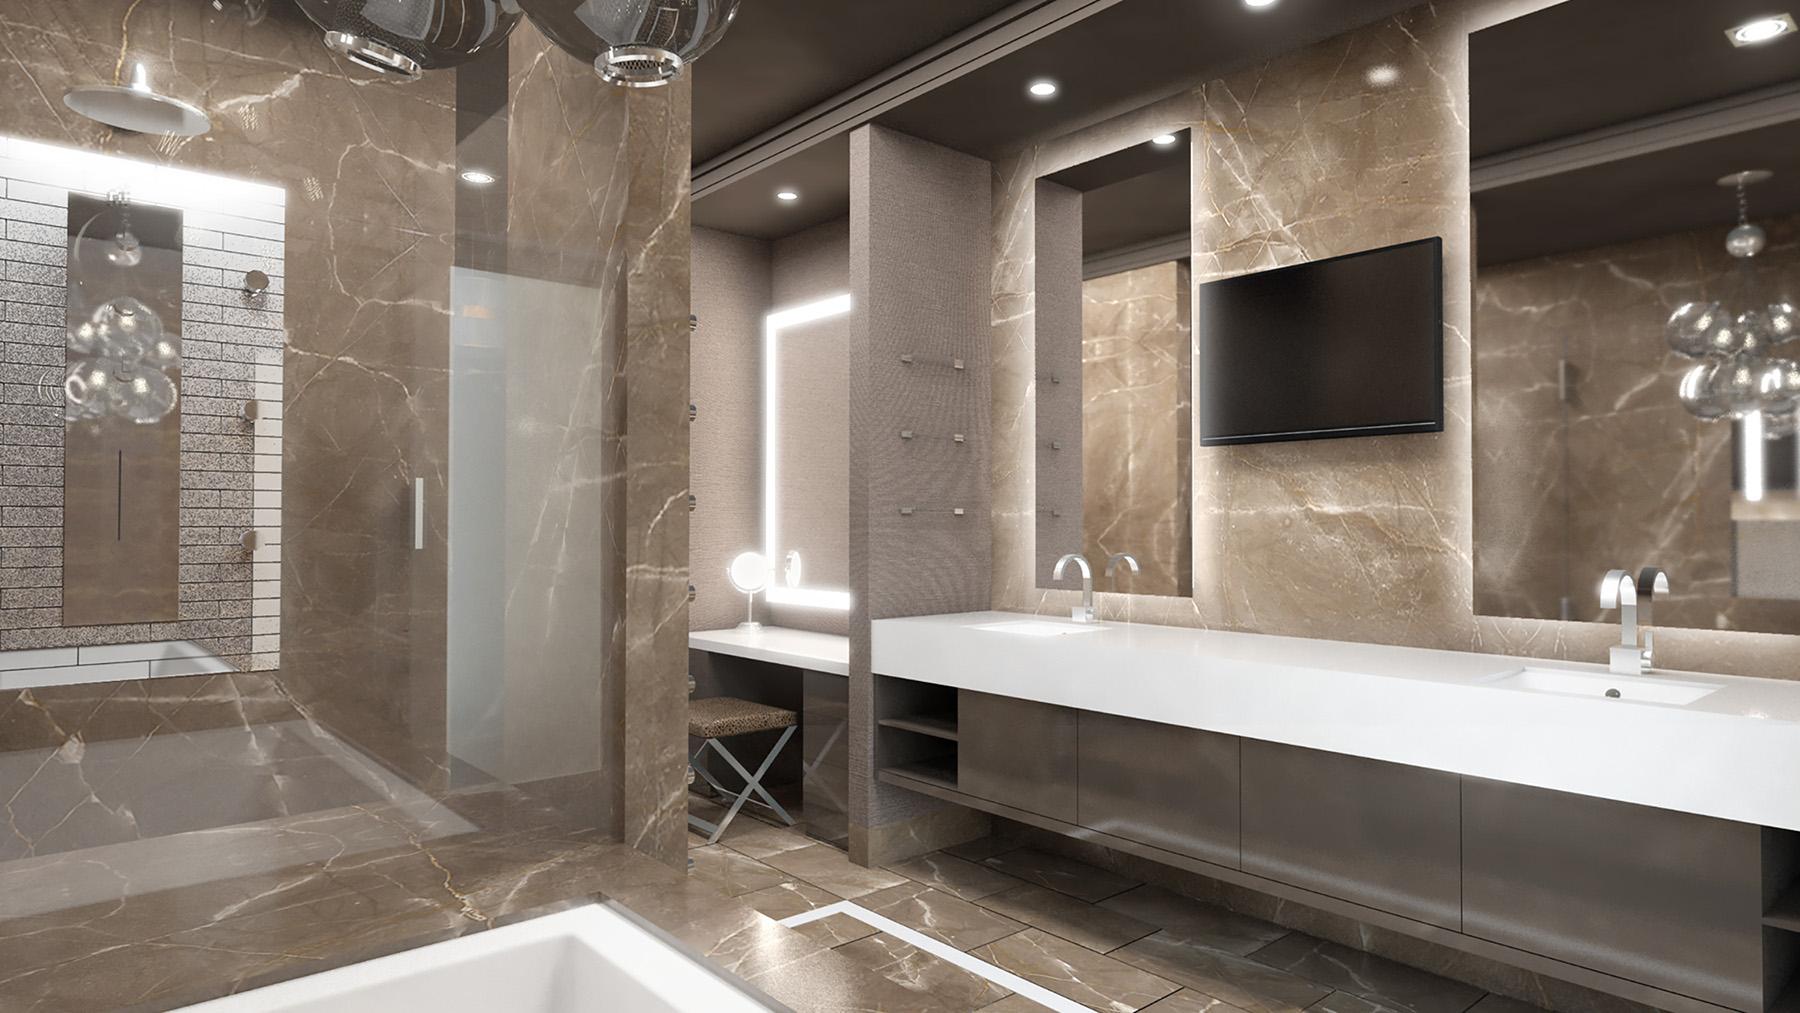 Hospitality Architecture Interior Design Golden Nugget Atlantic City Villa Master Bathroom